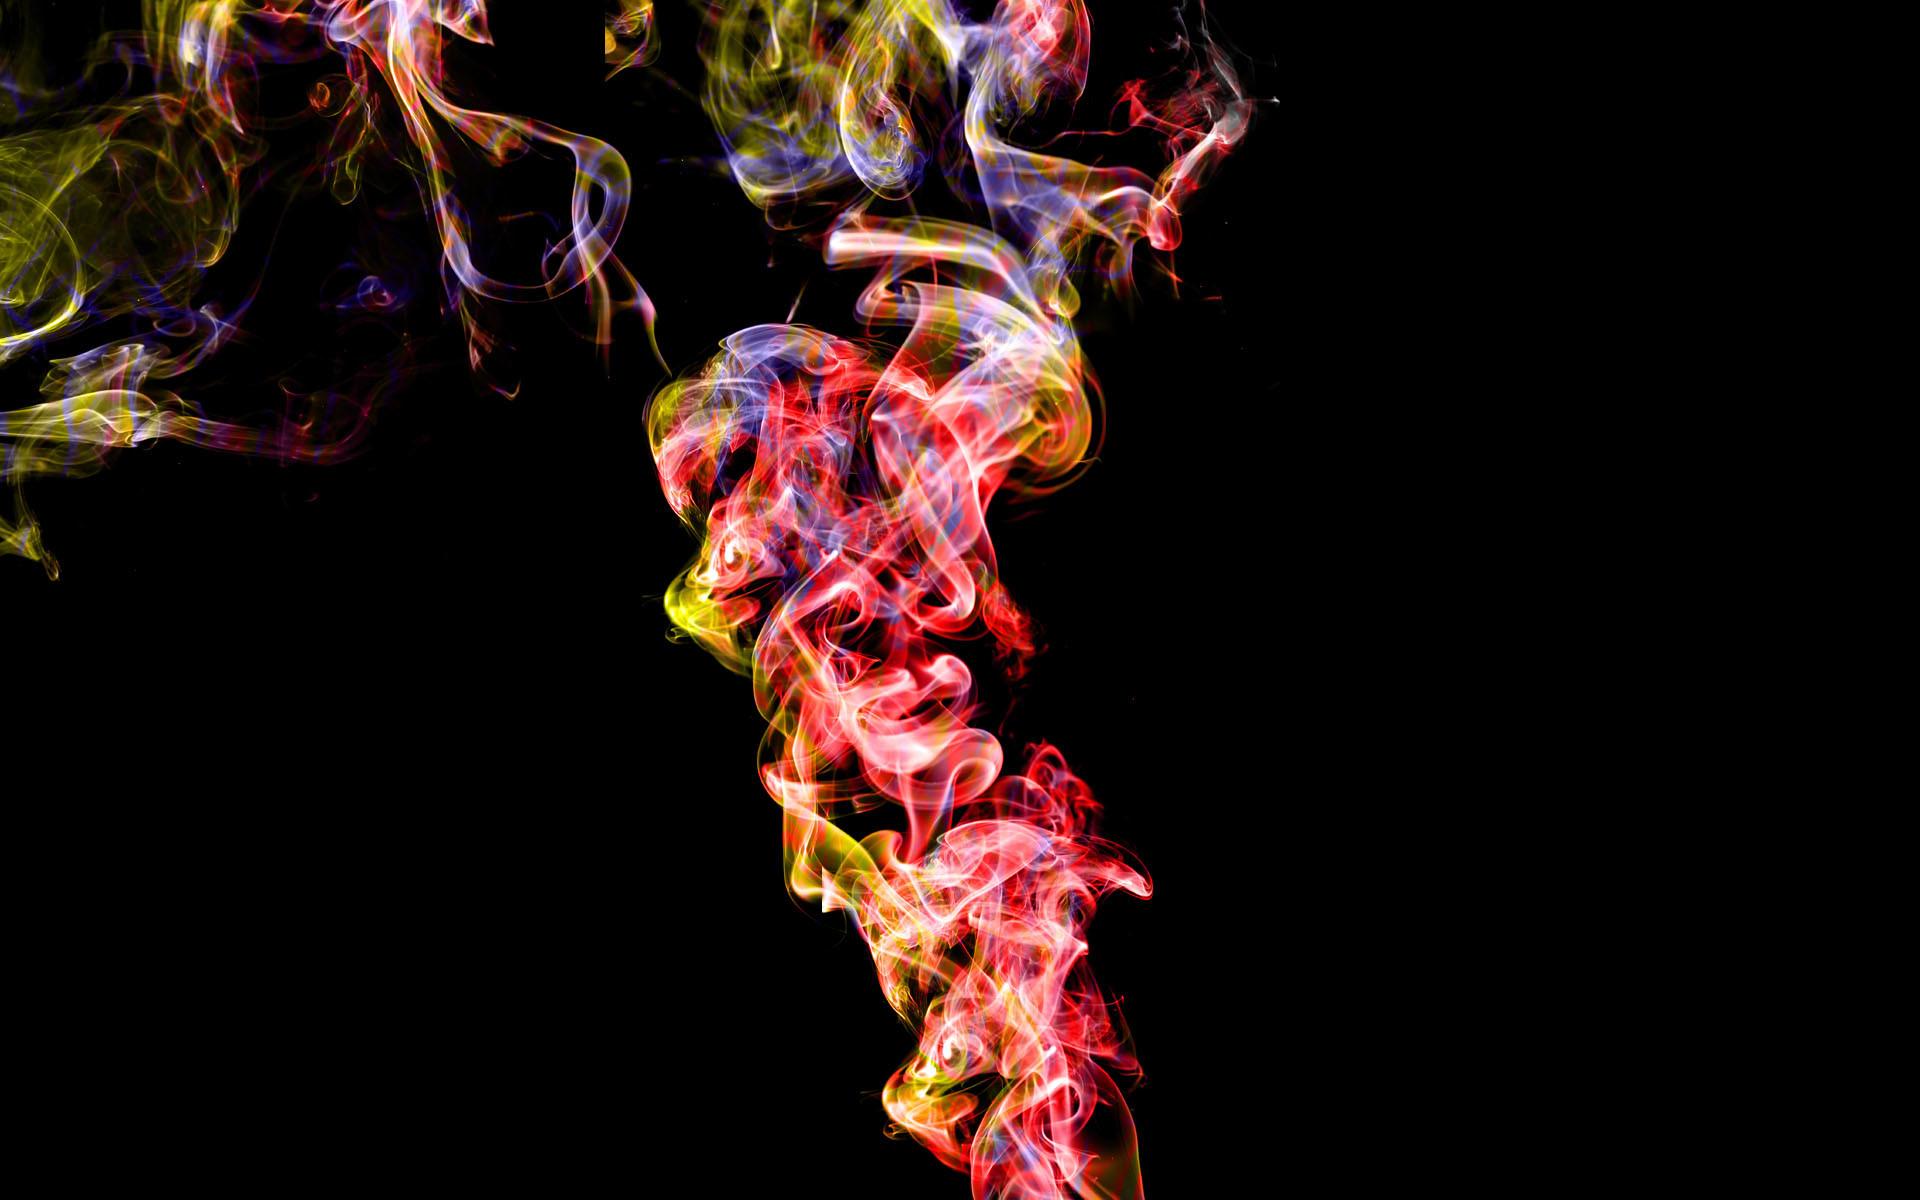 Colorful Smoke Wallpaper Iphone